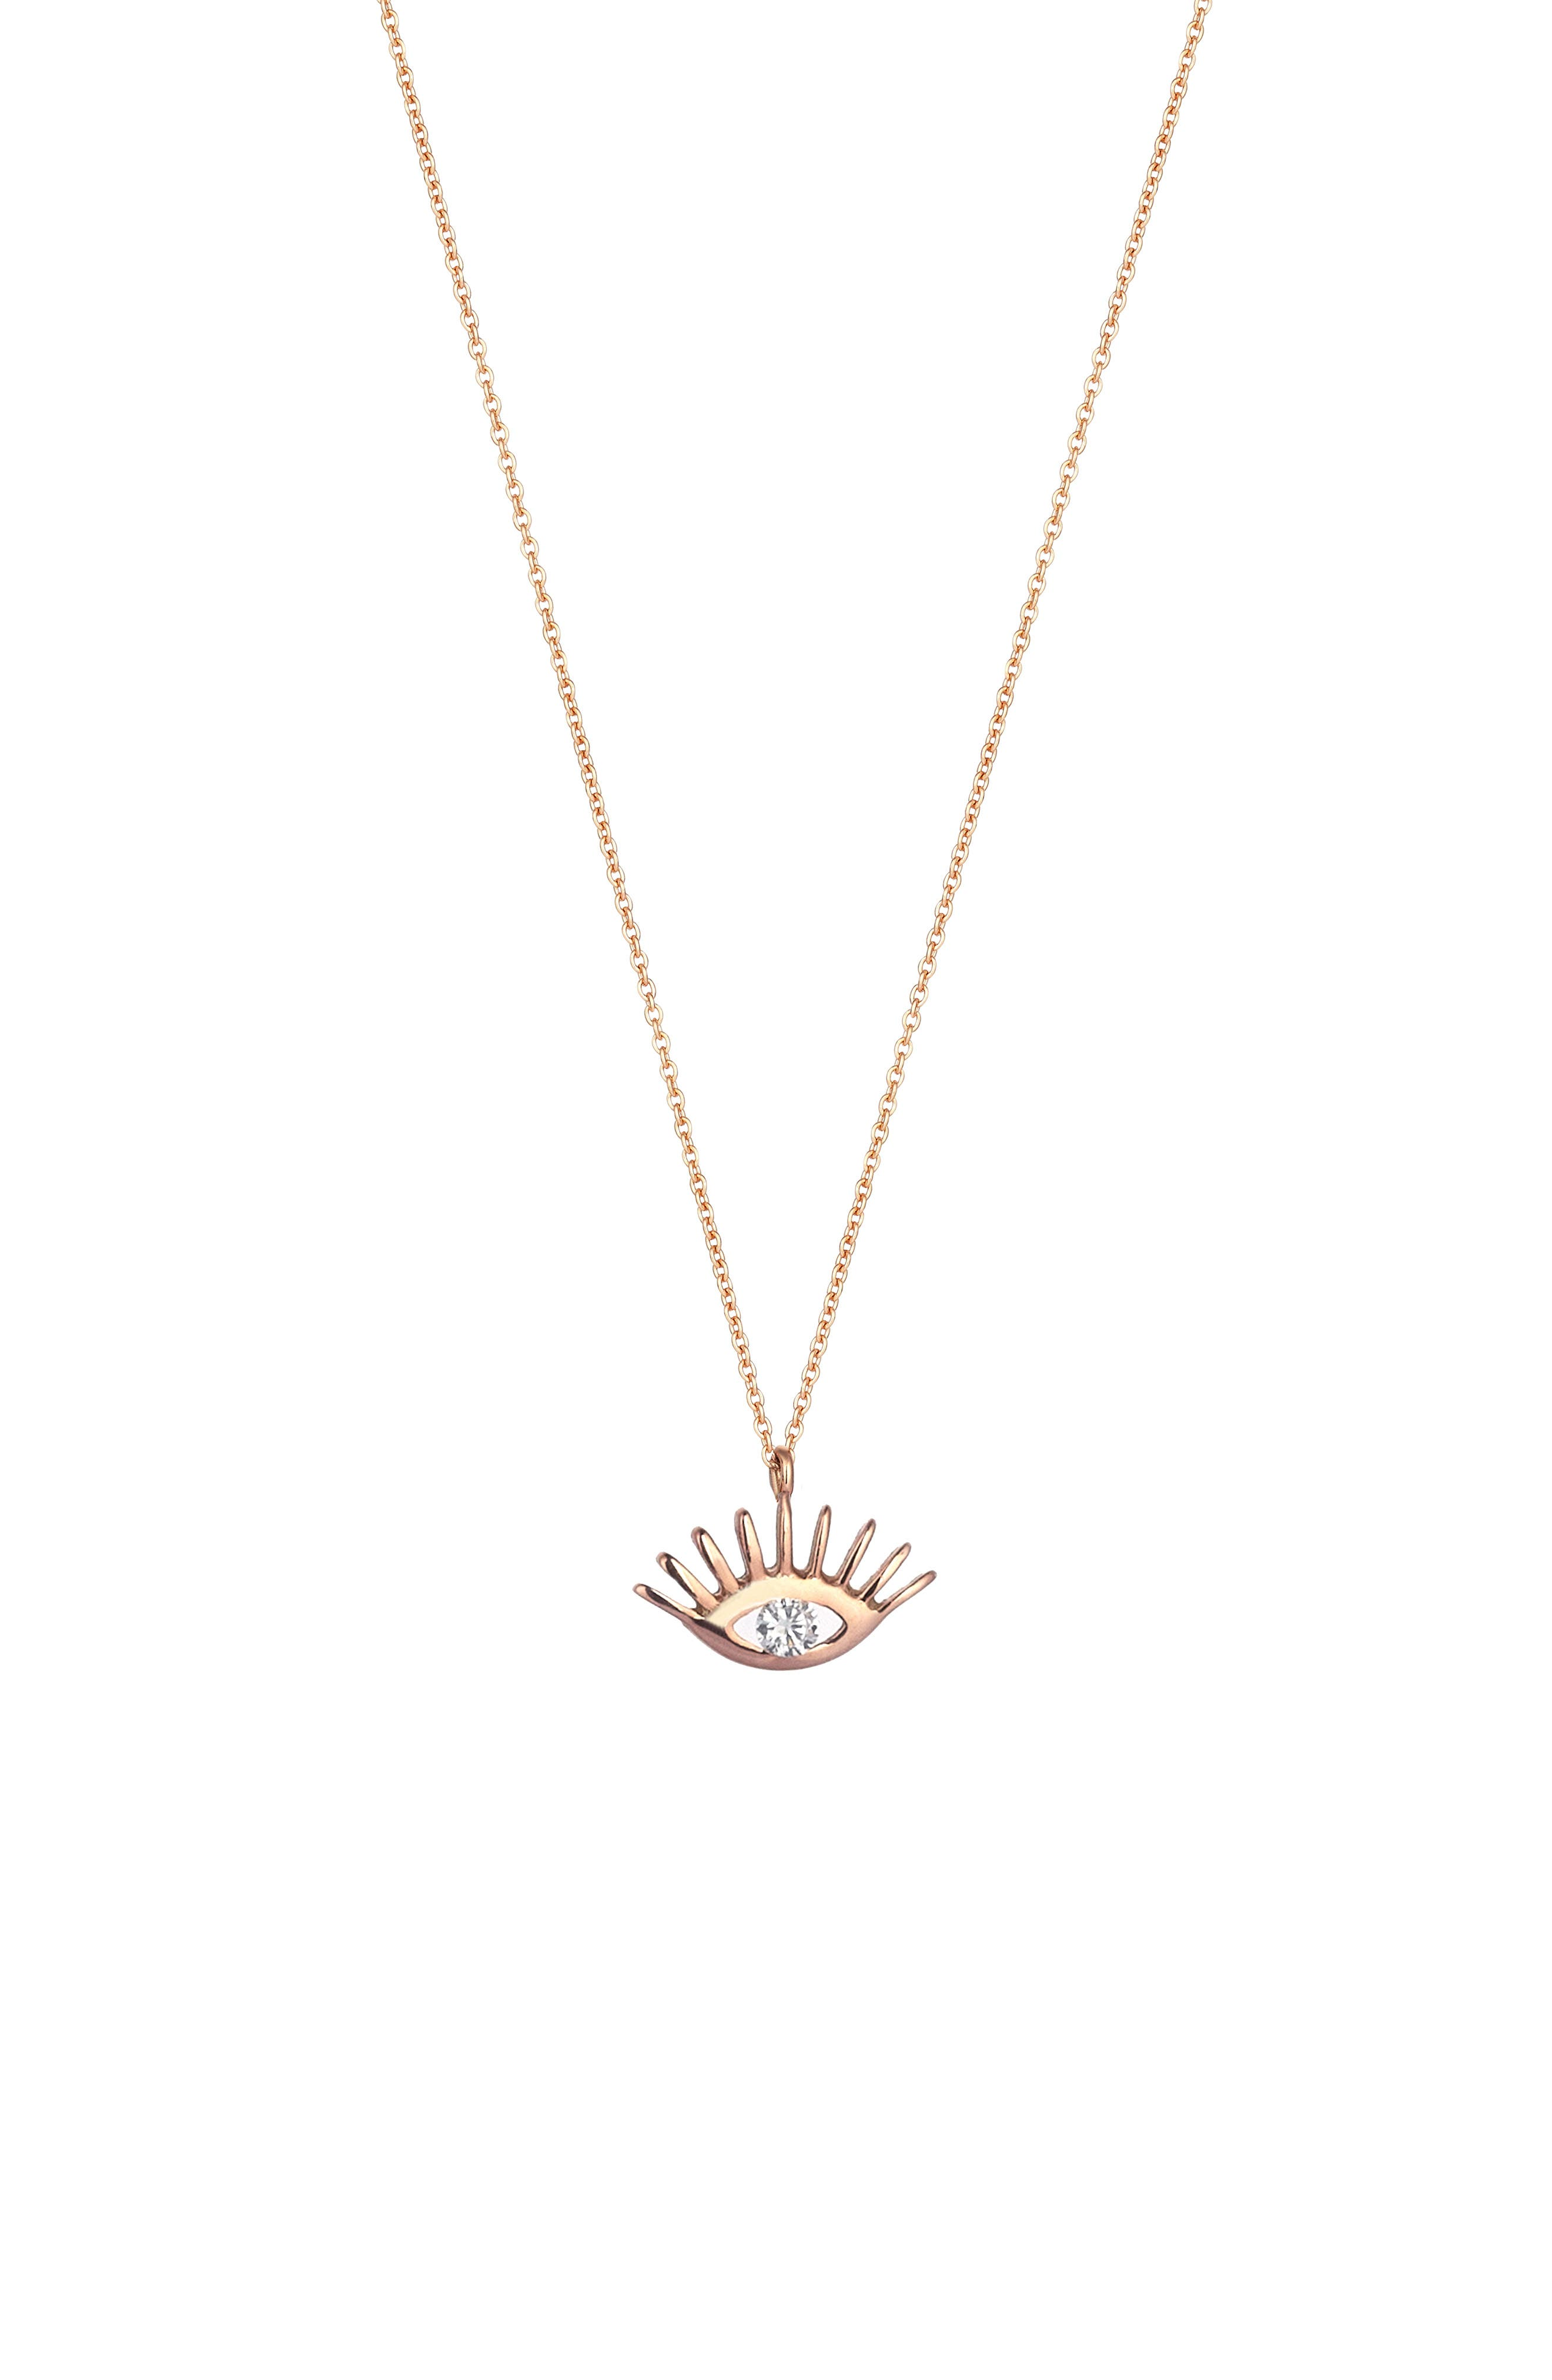 Main Image - Kismet by Milka Diamond Pendant Necklace